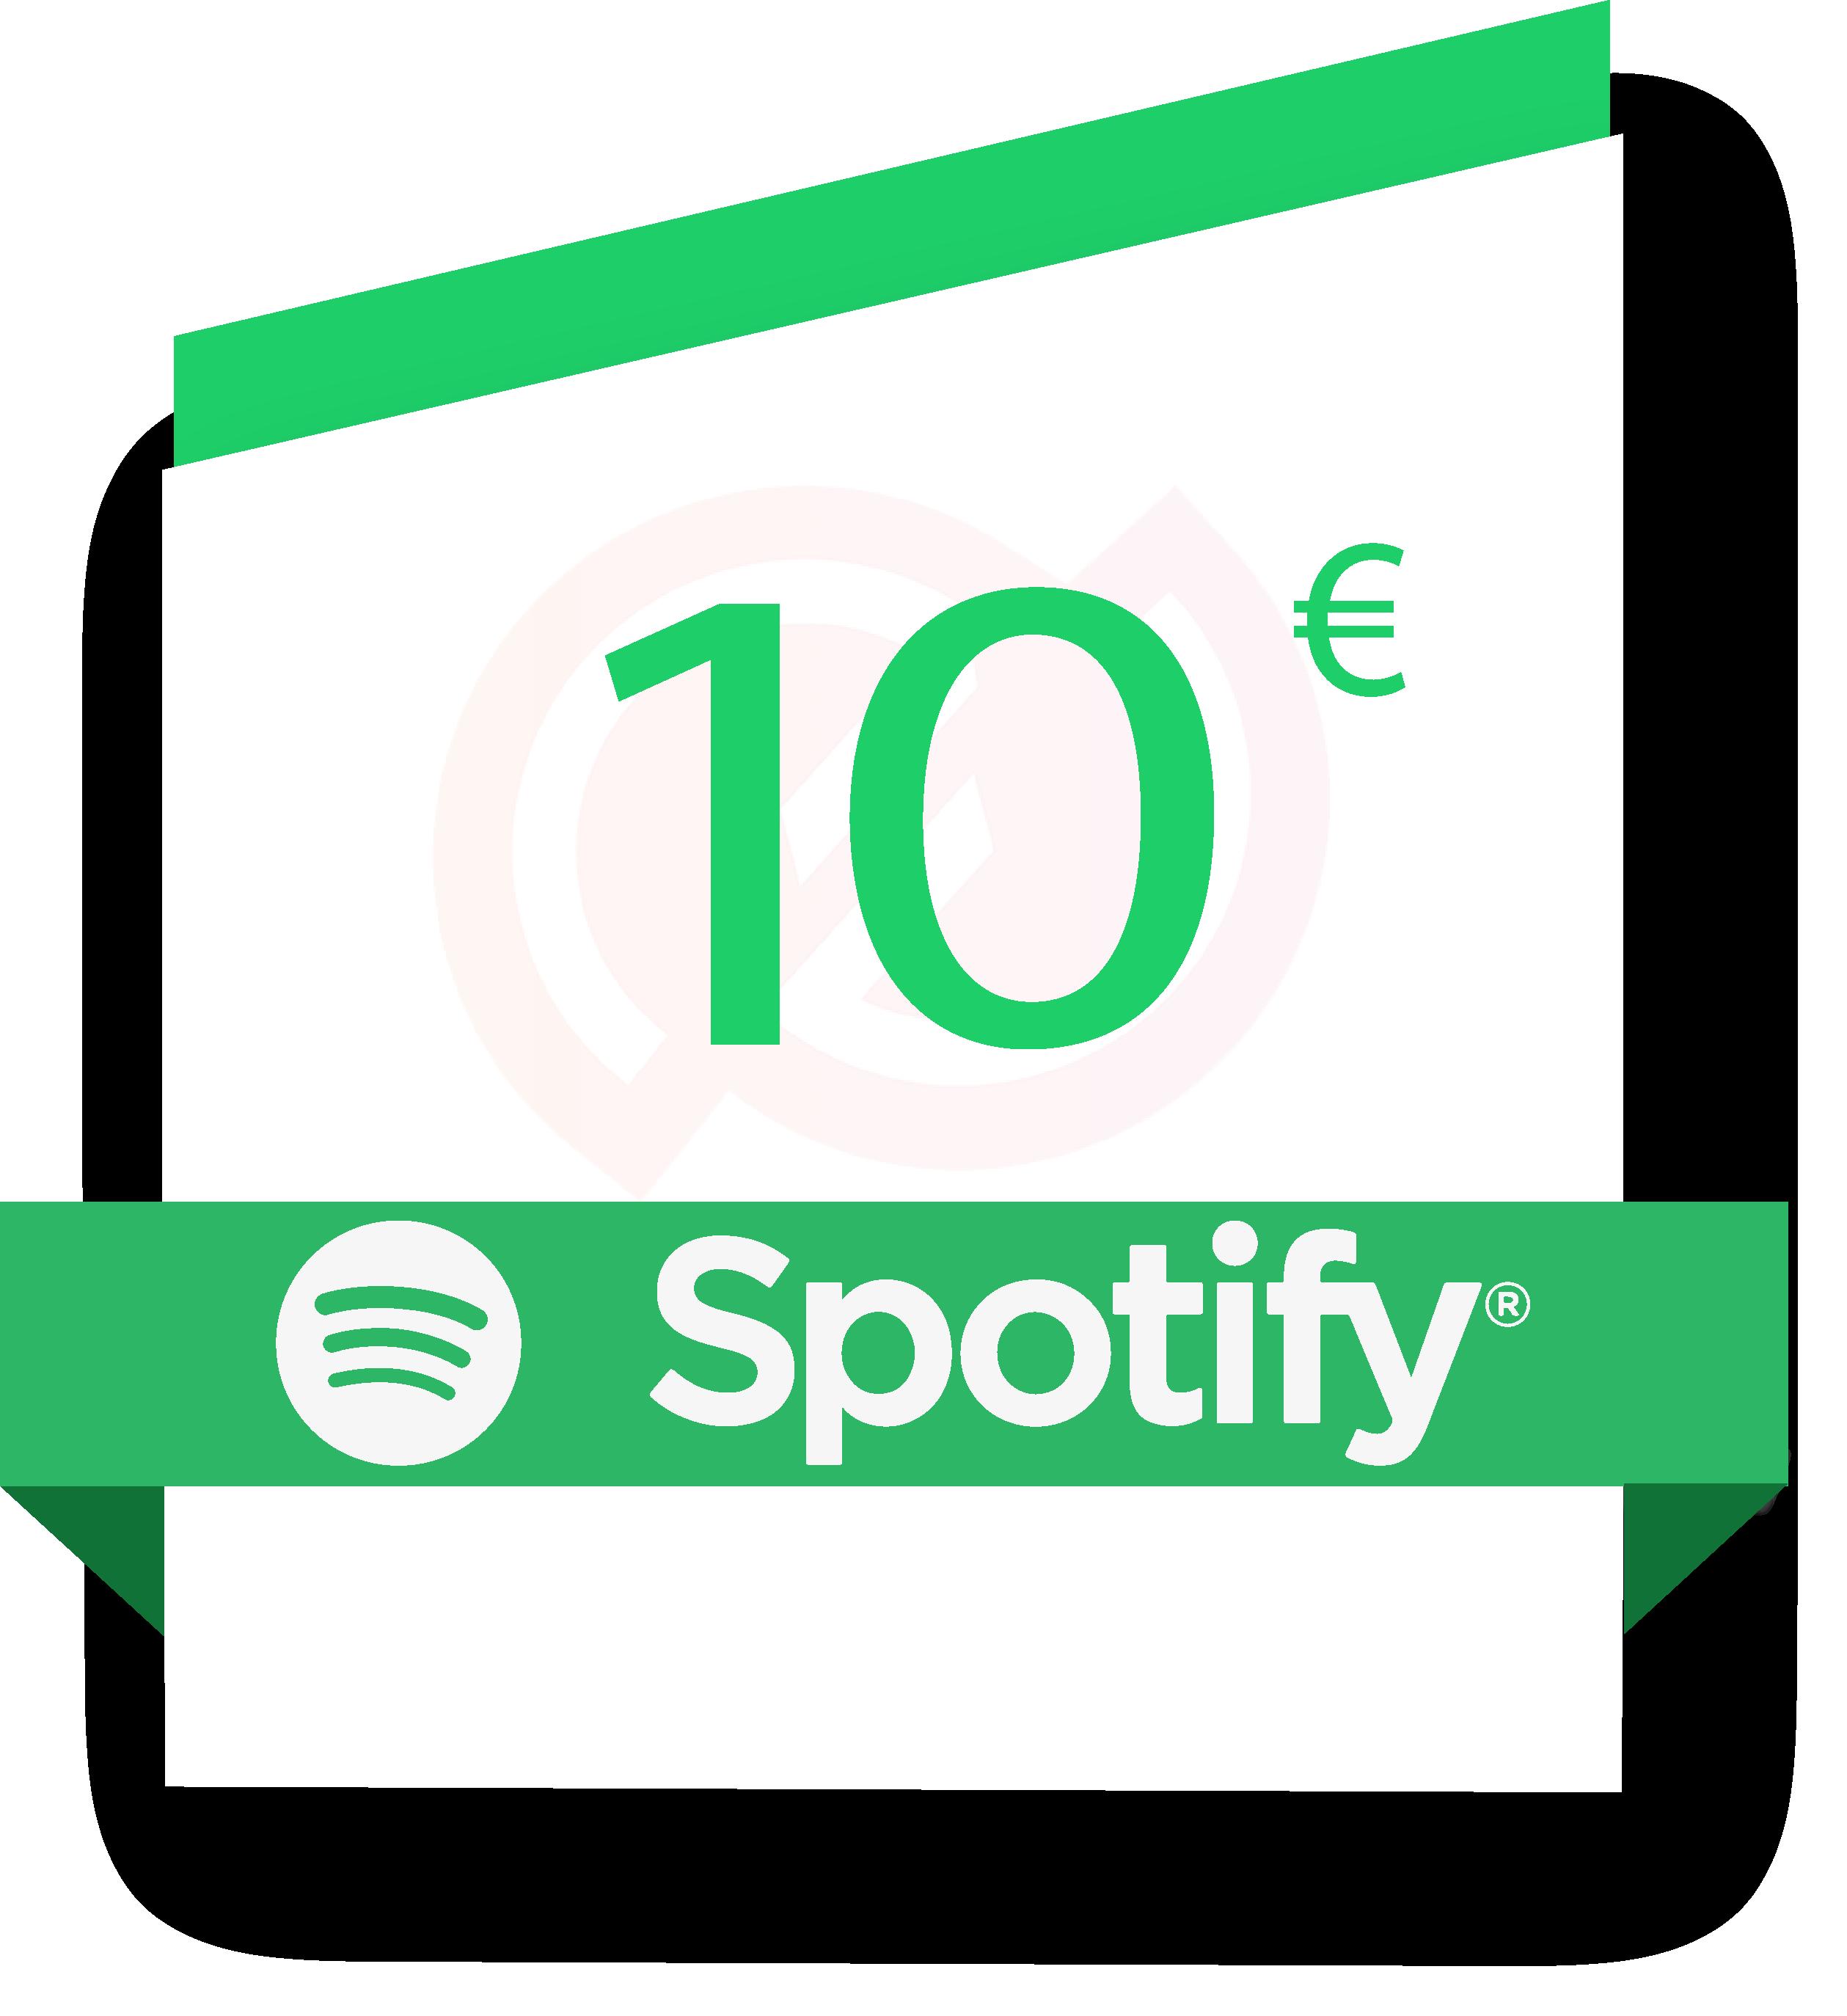 spotify-10-euros